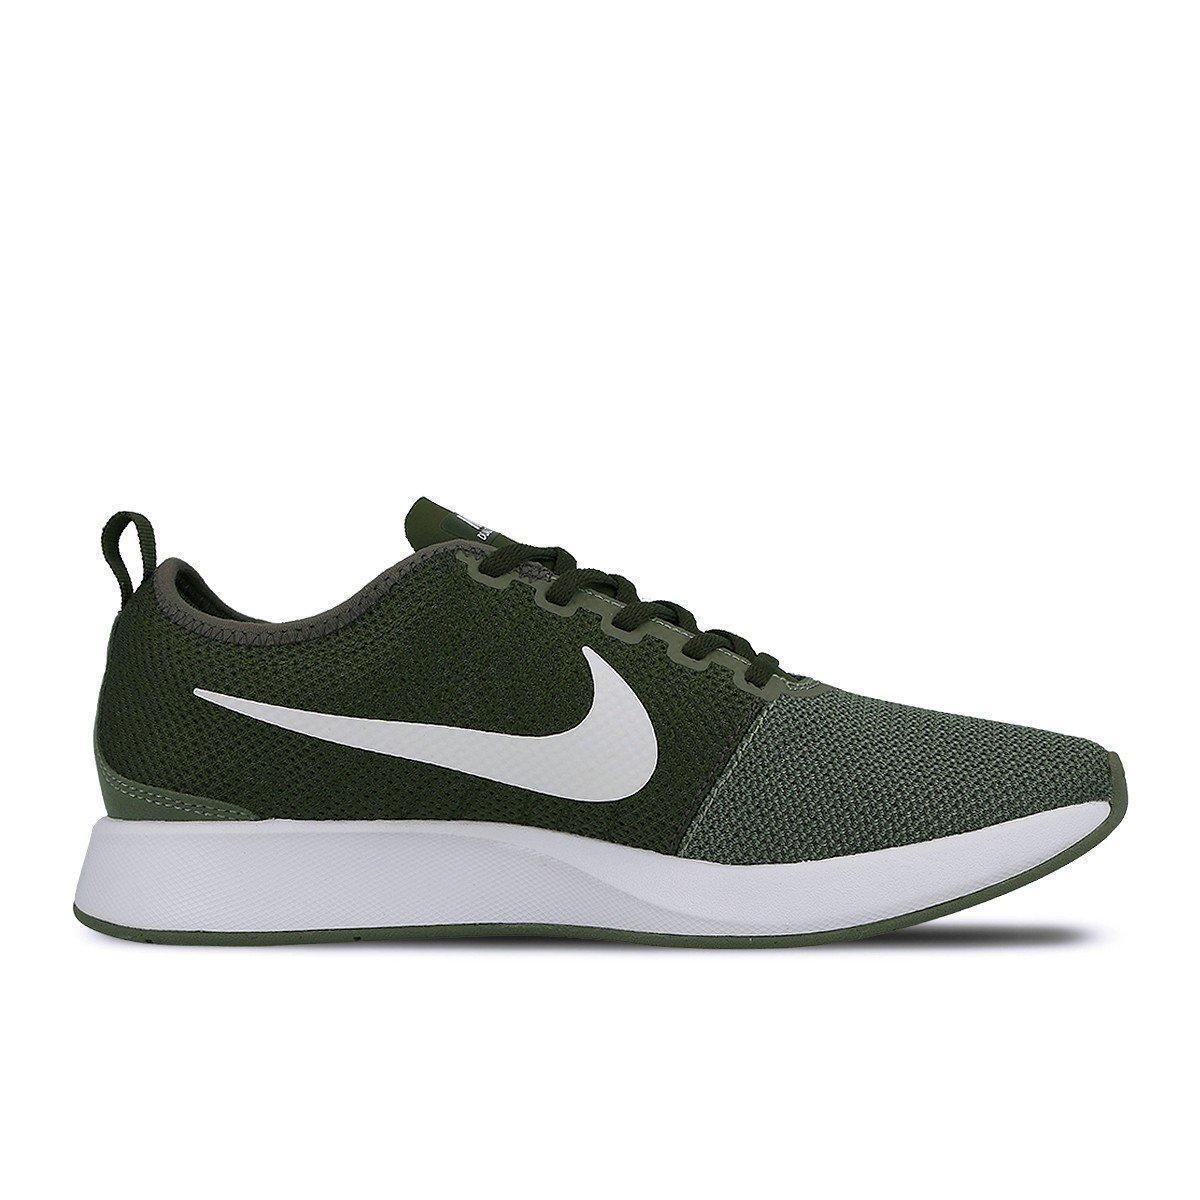 Herren Nike Turnschuhe DUALTONE Racer Fluss Felsen Turnschuhe Nike 918227 004 00a26c